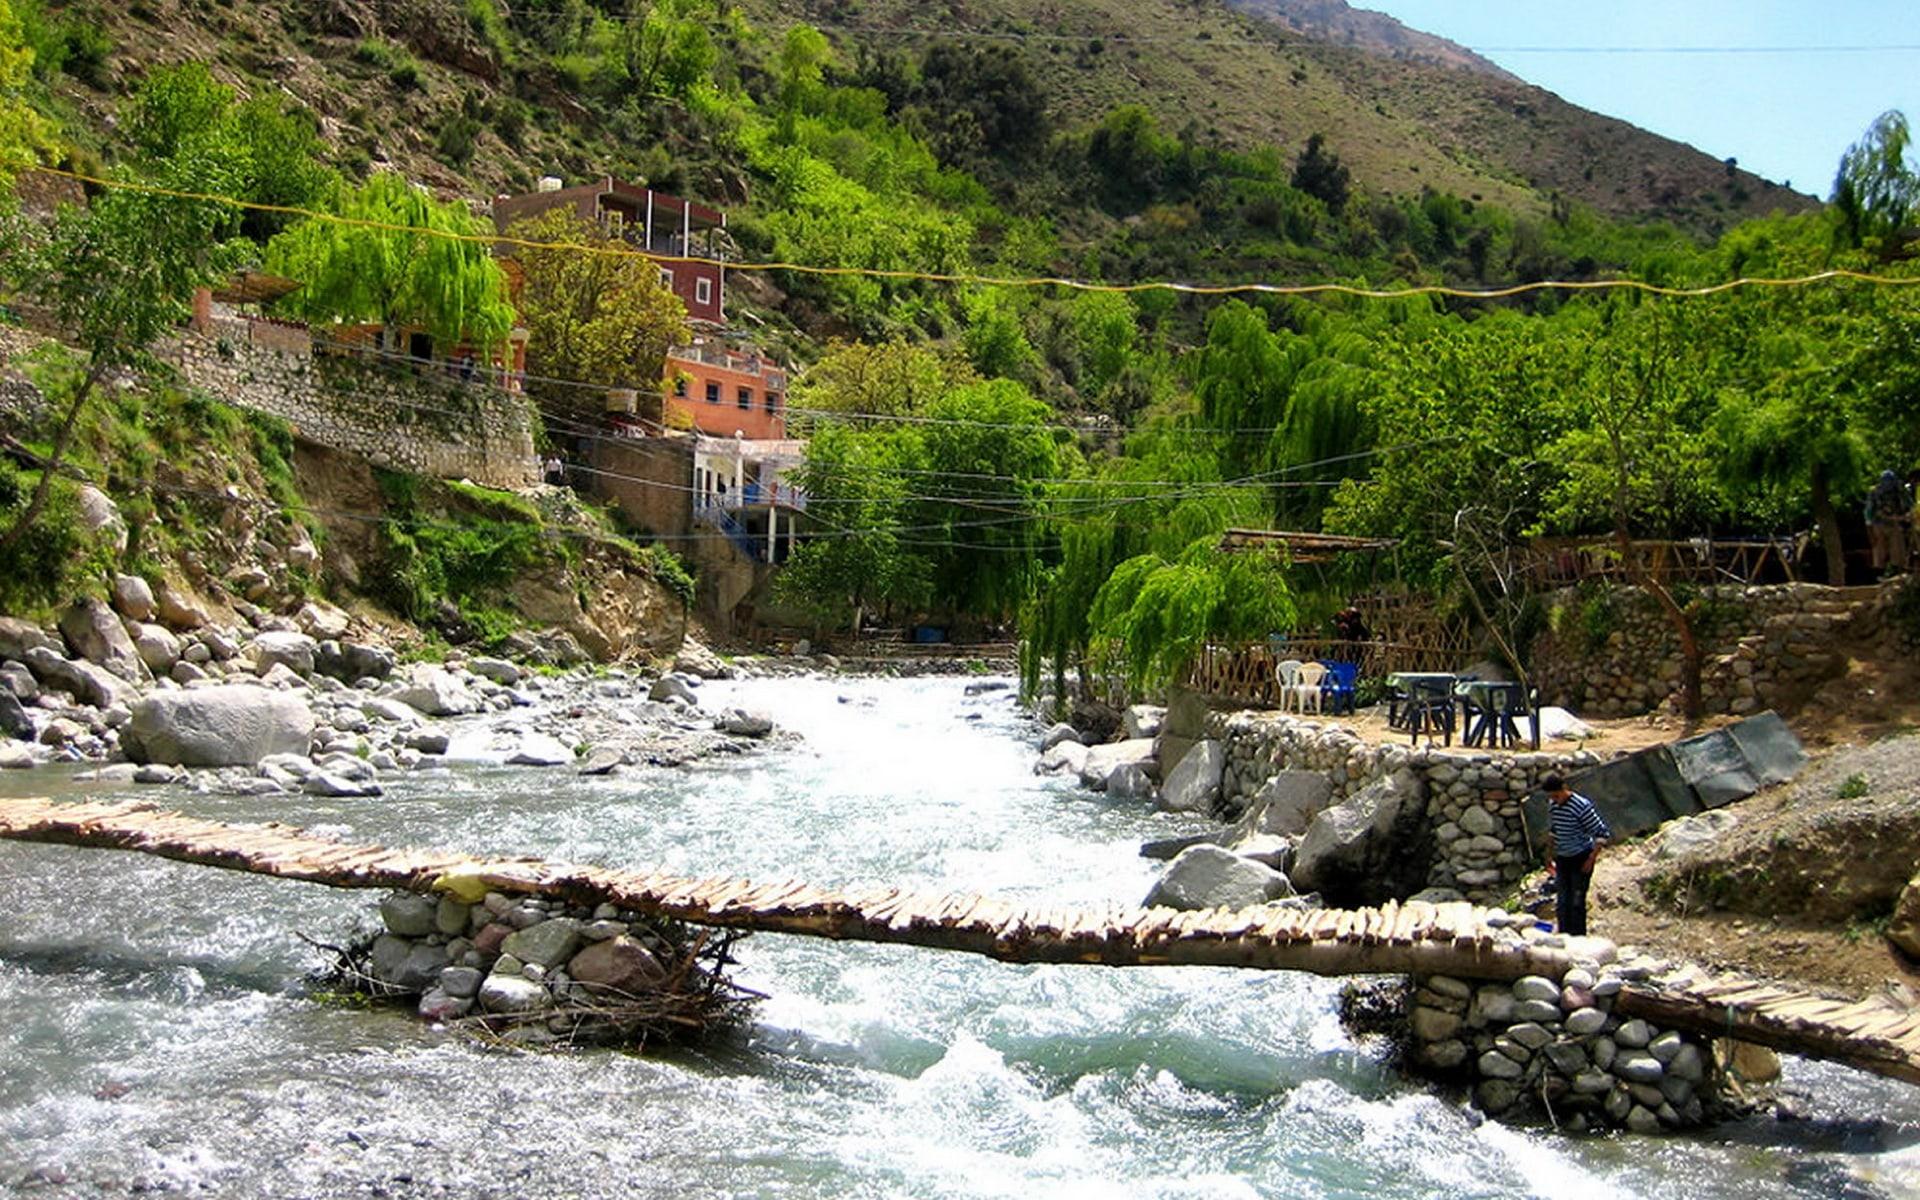 Active Treks Morocco - Ourika Waterfalls Day Trip